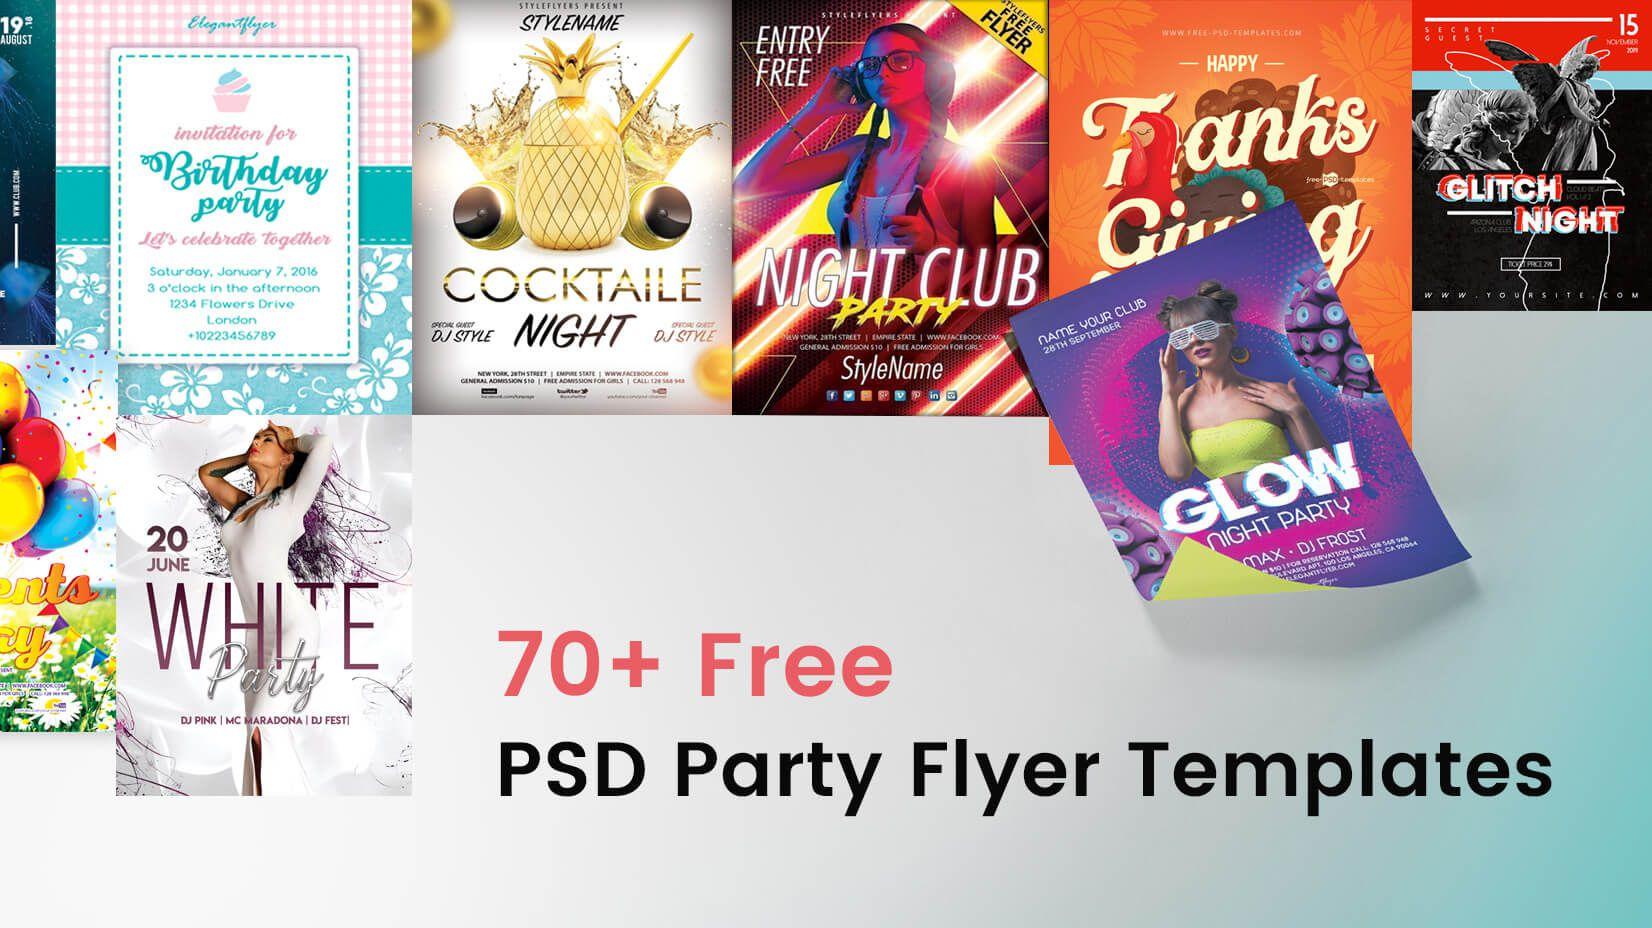 006 Wondrou Event Flyer Template Free Psd Sample  Music BoxingFull